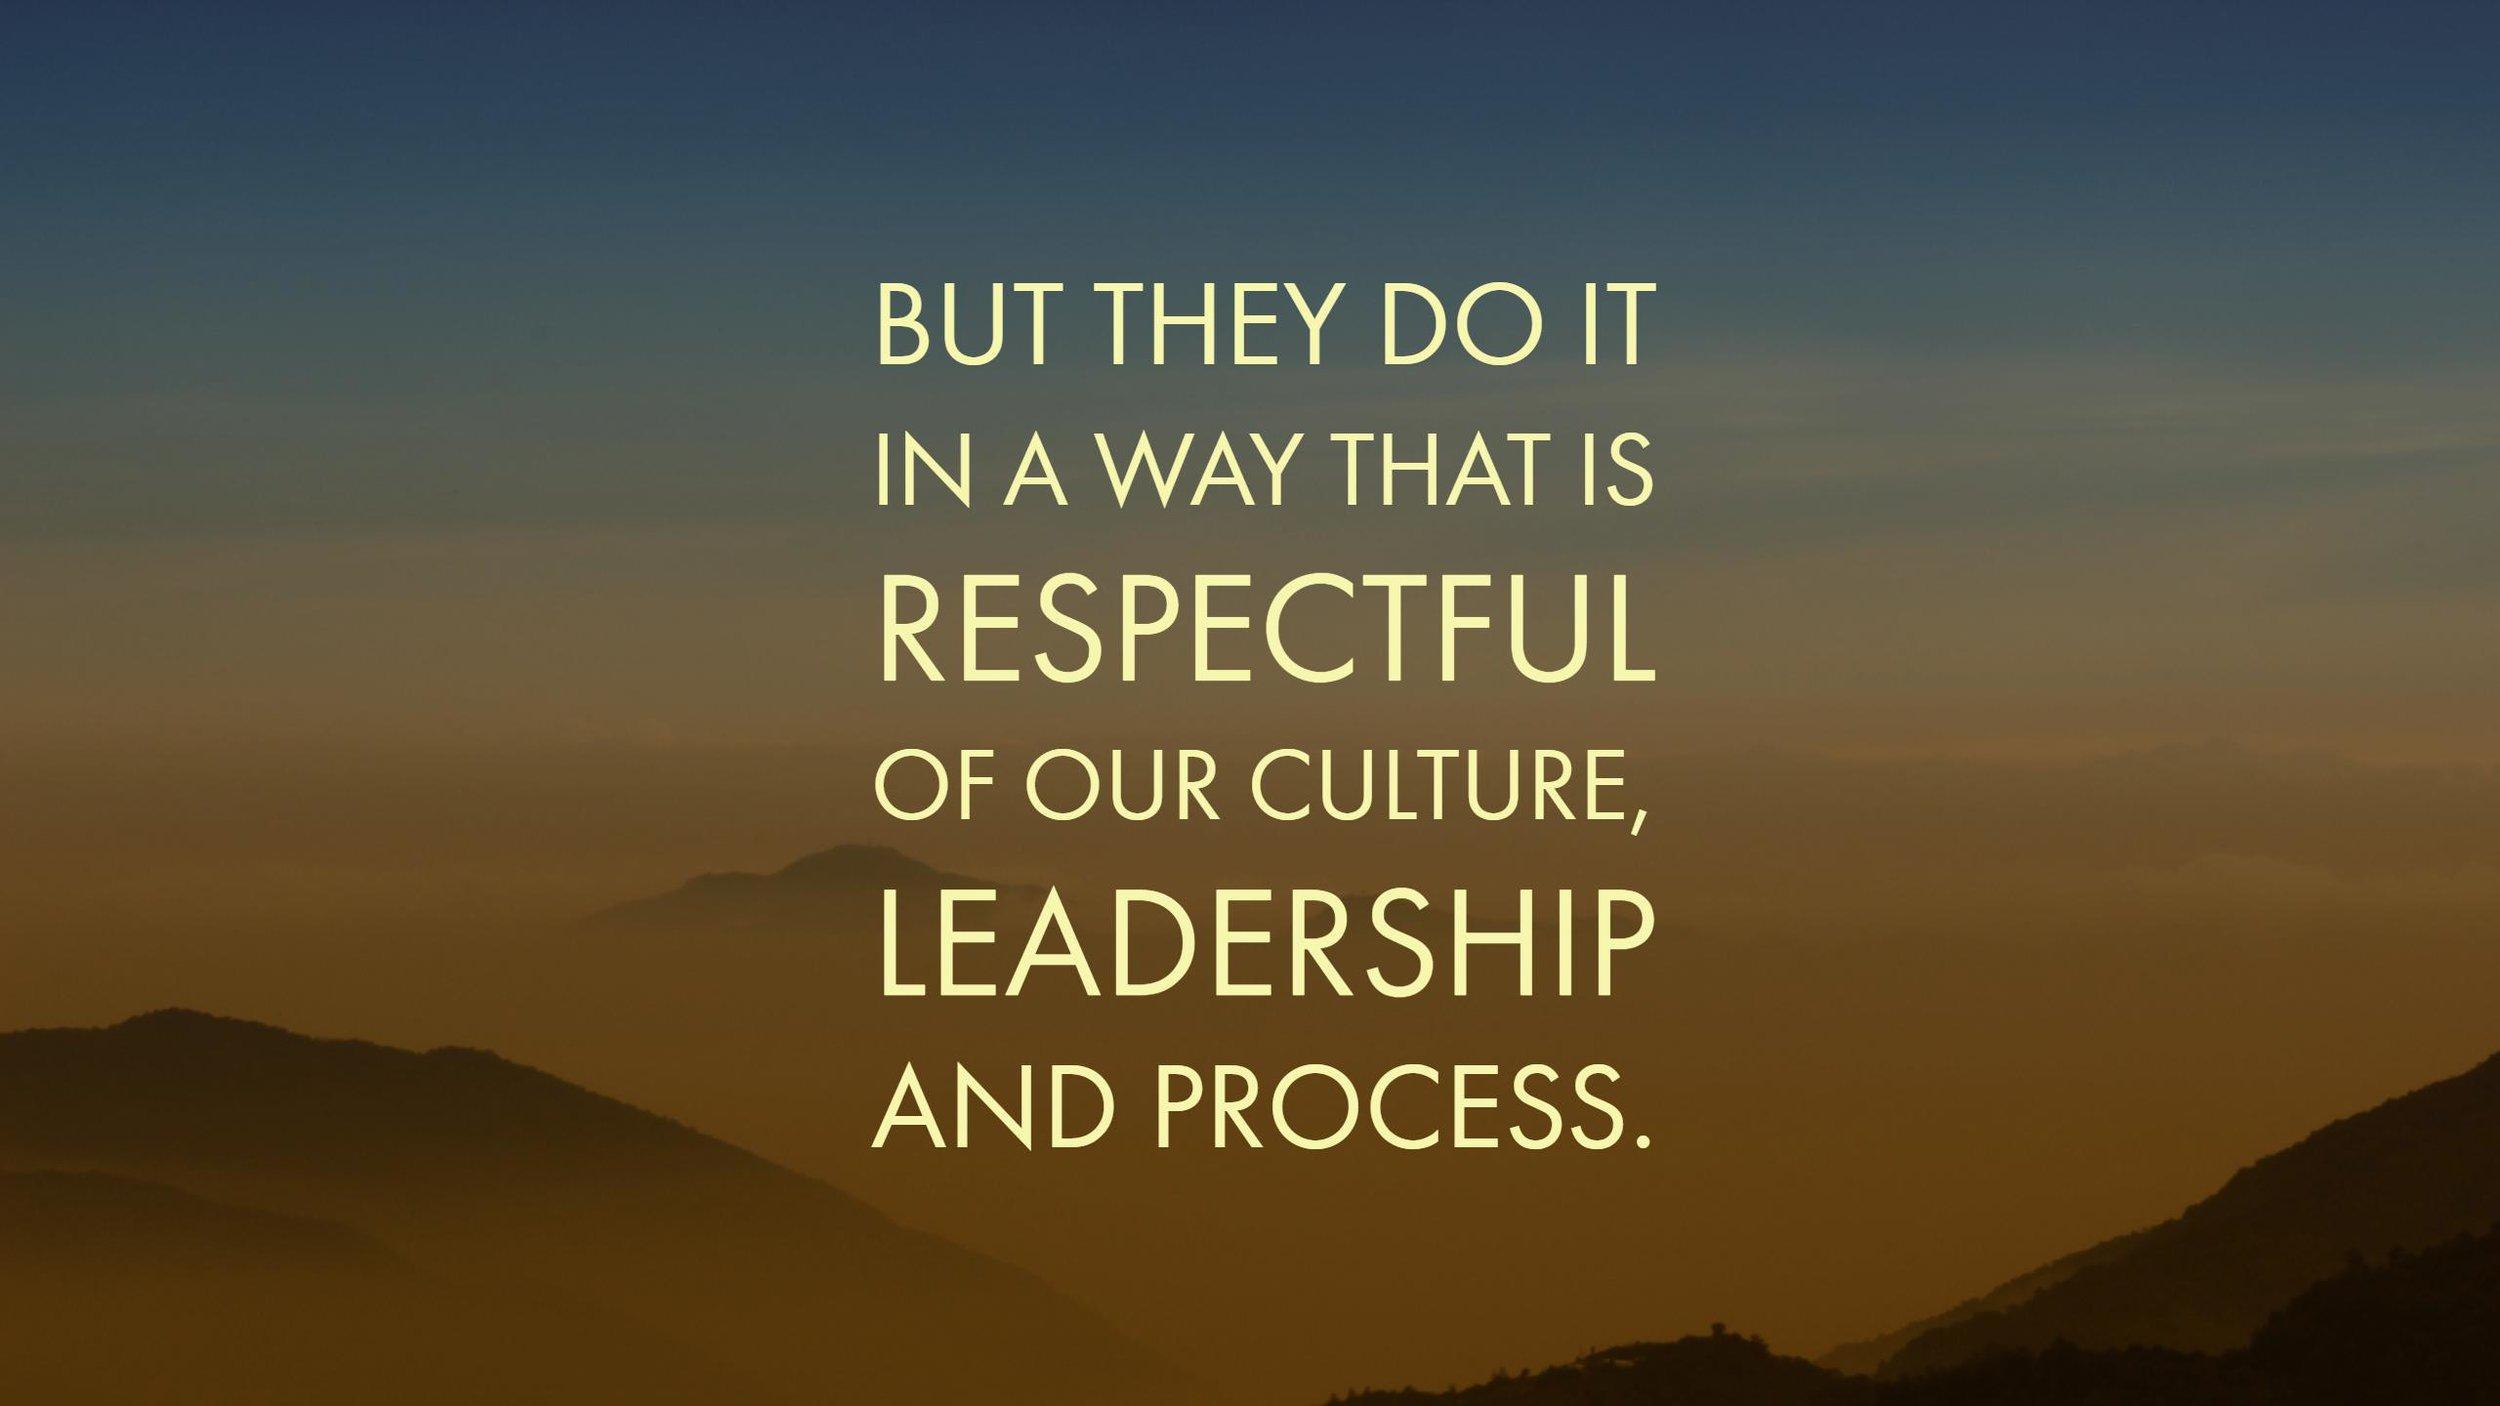 Image 20 - Respectful (1).jpg